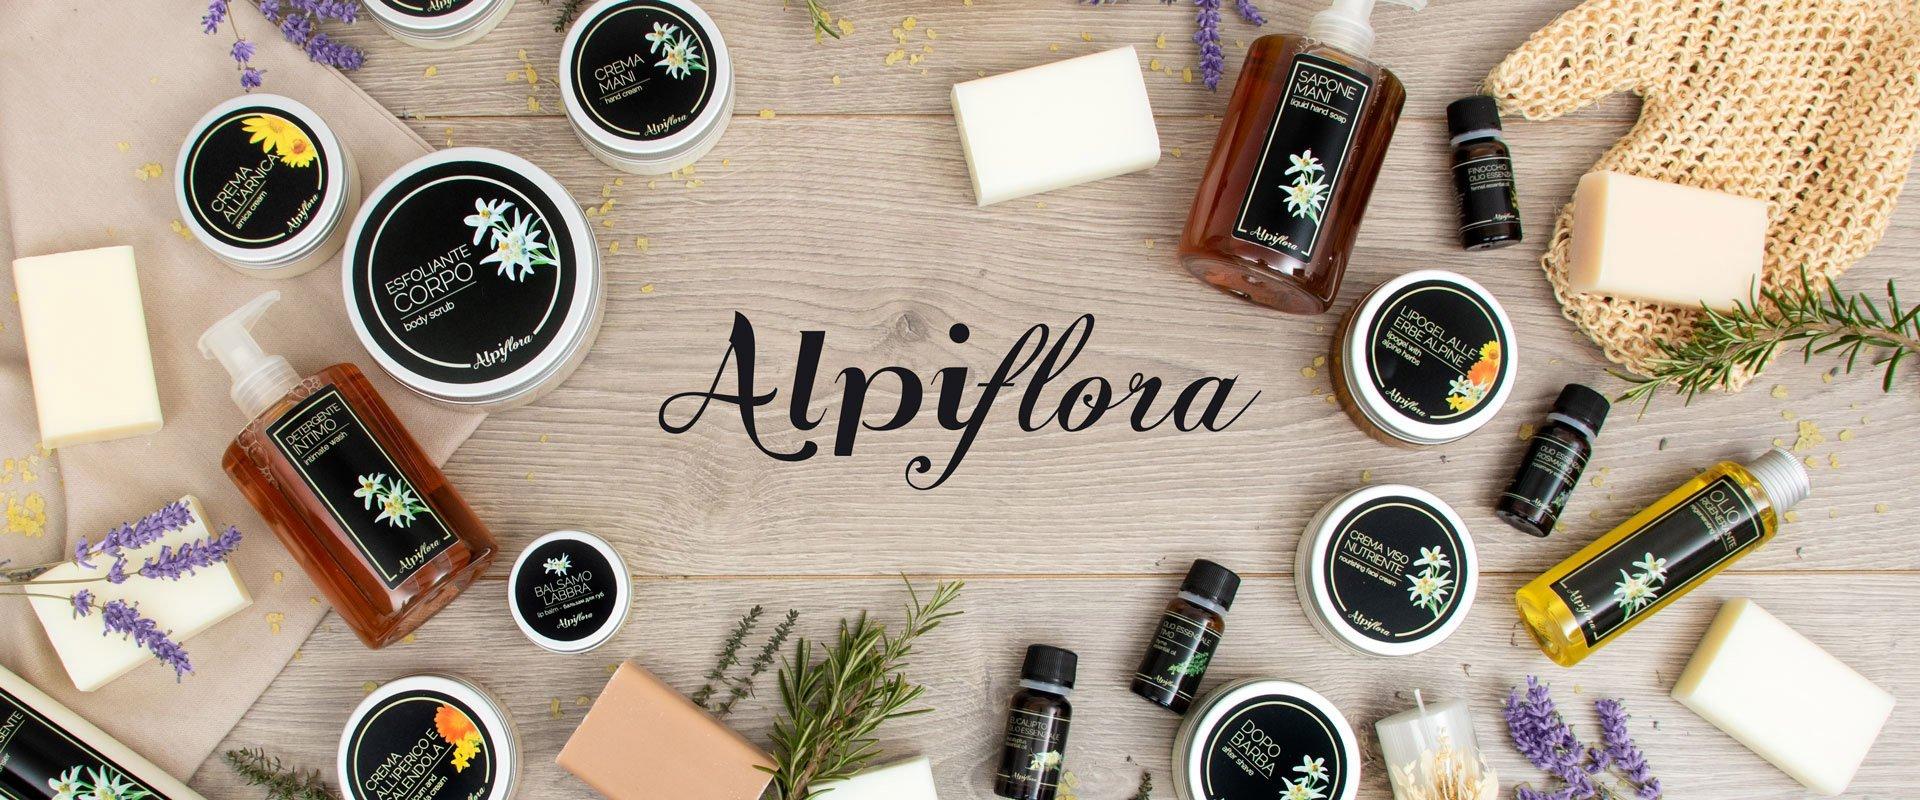 Alpiflora, cosmesi natuale alpina